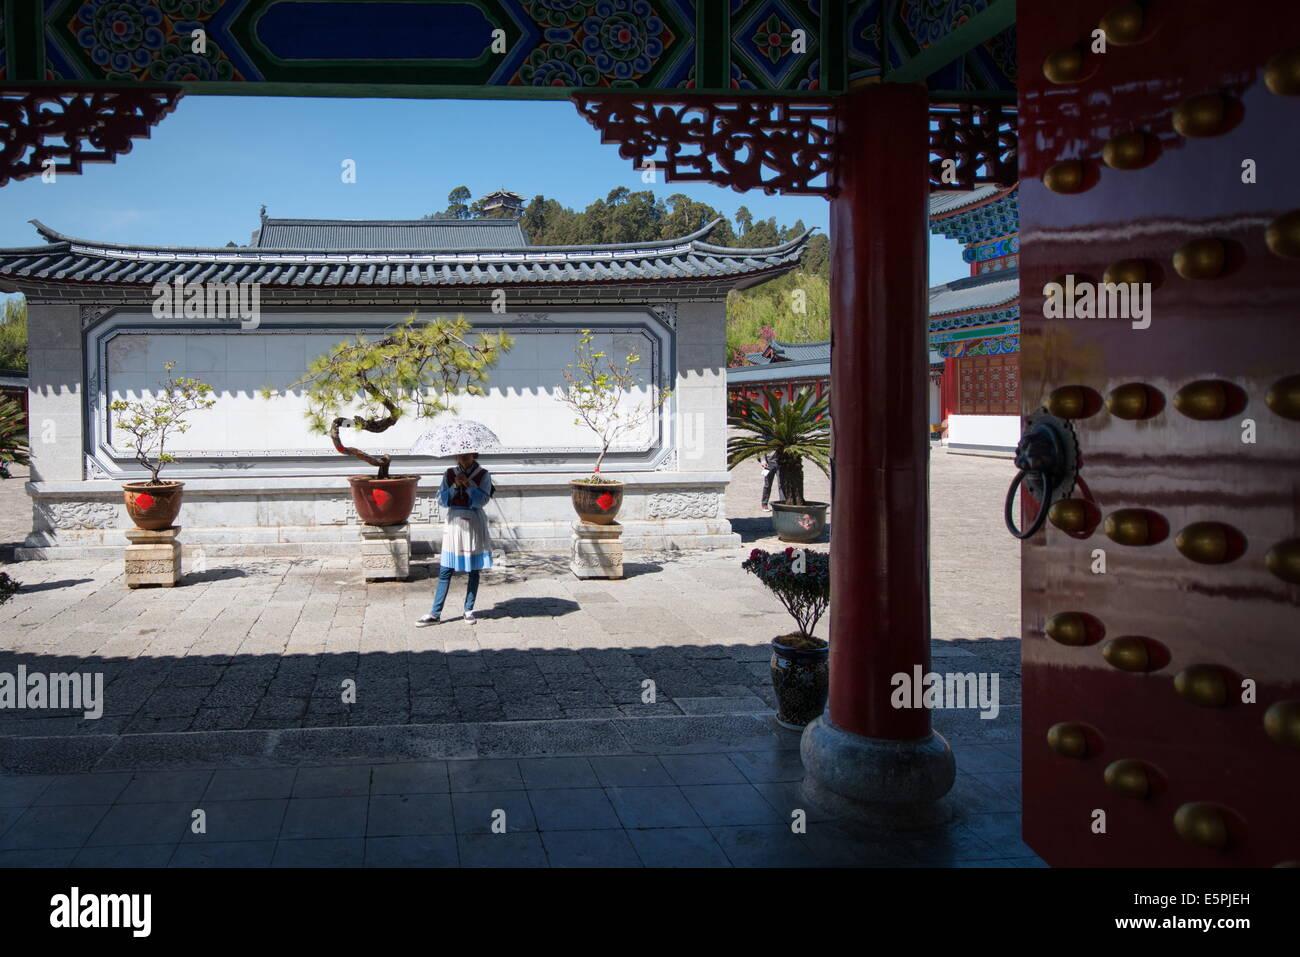 Main entrance of Mufu complex, Lijiang, Yunnan, China, Asia - Stock Image